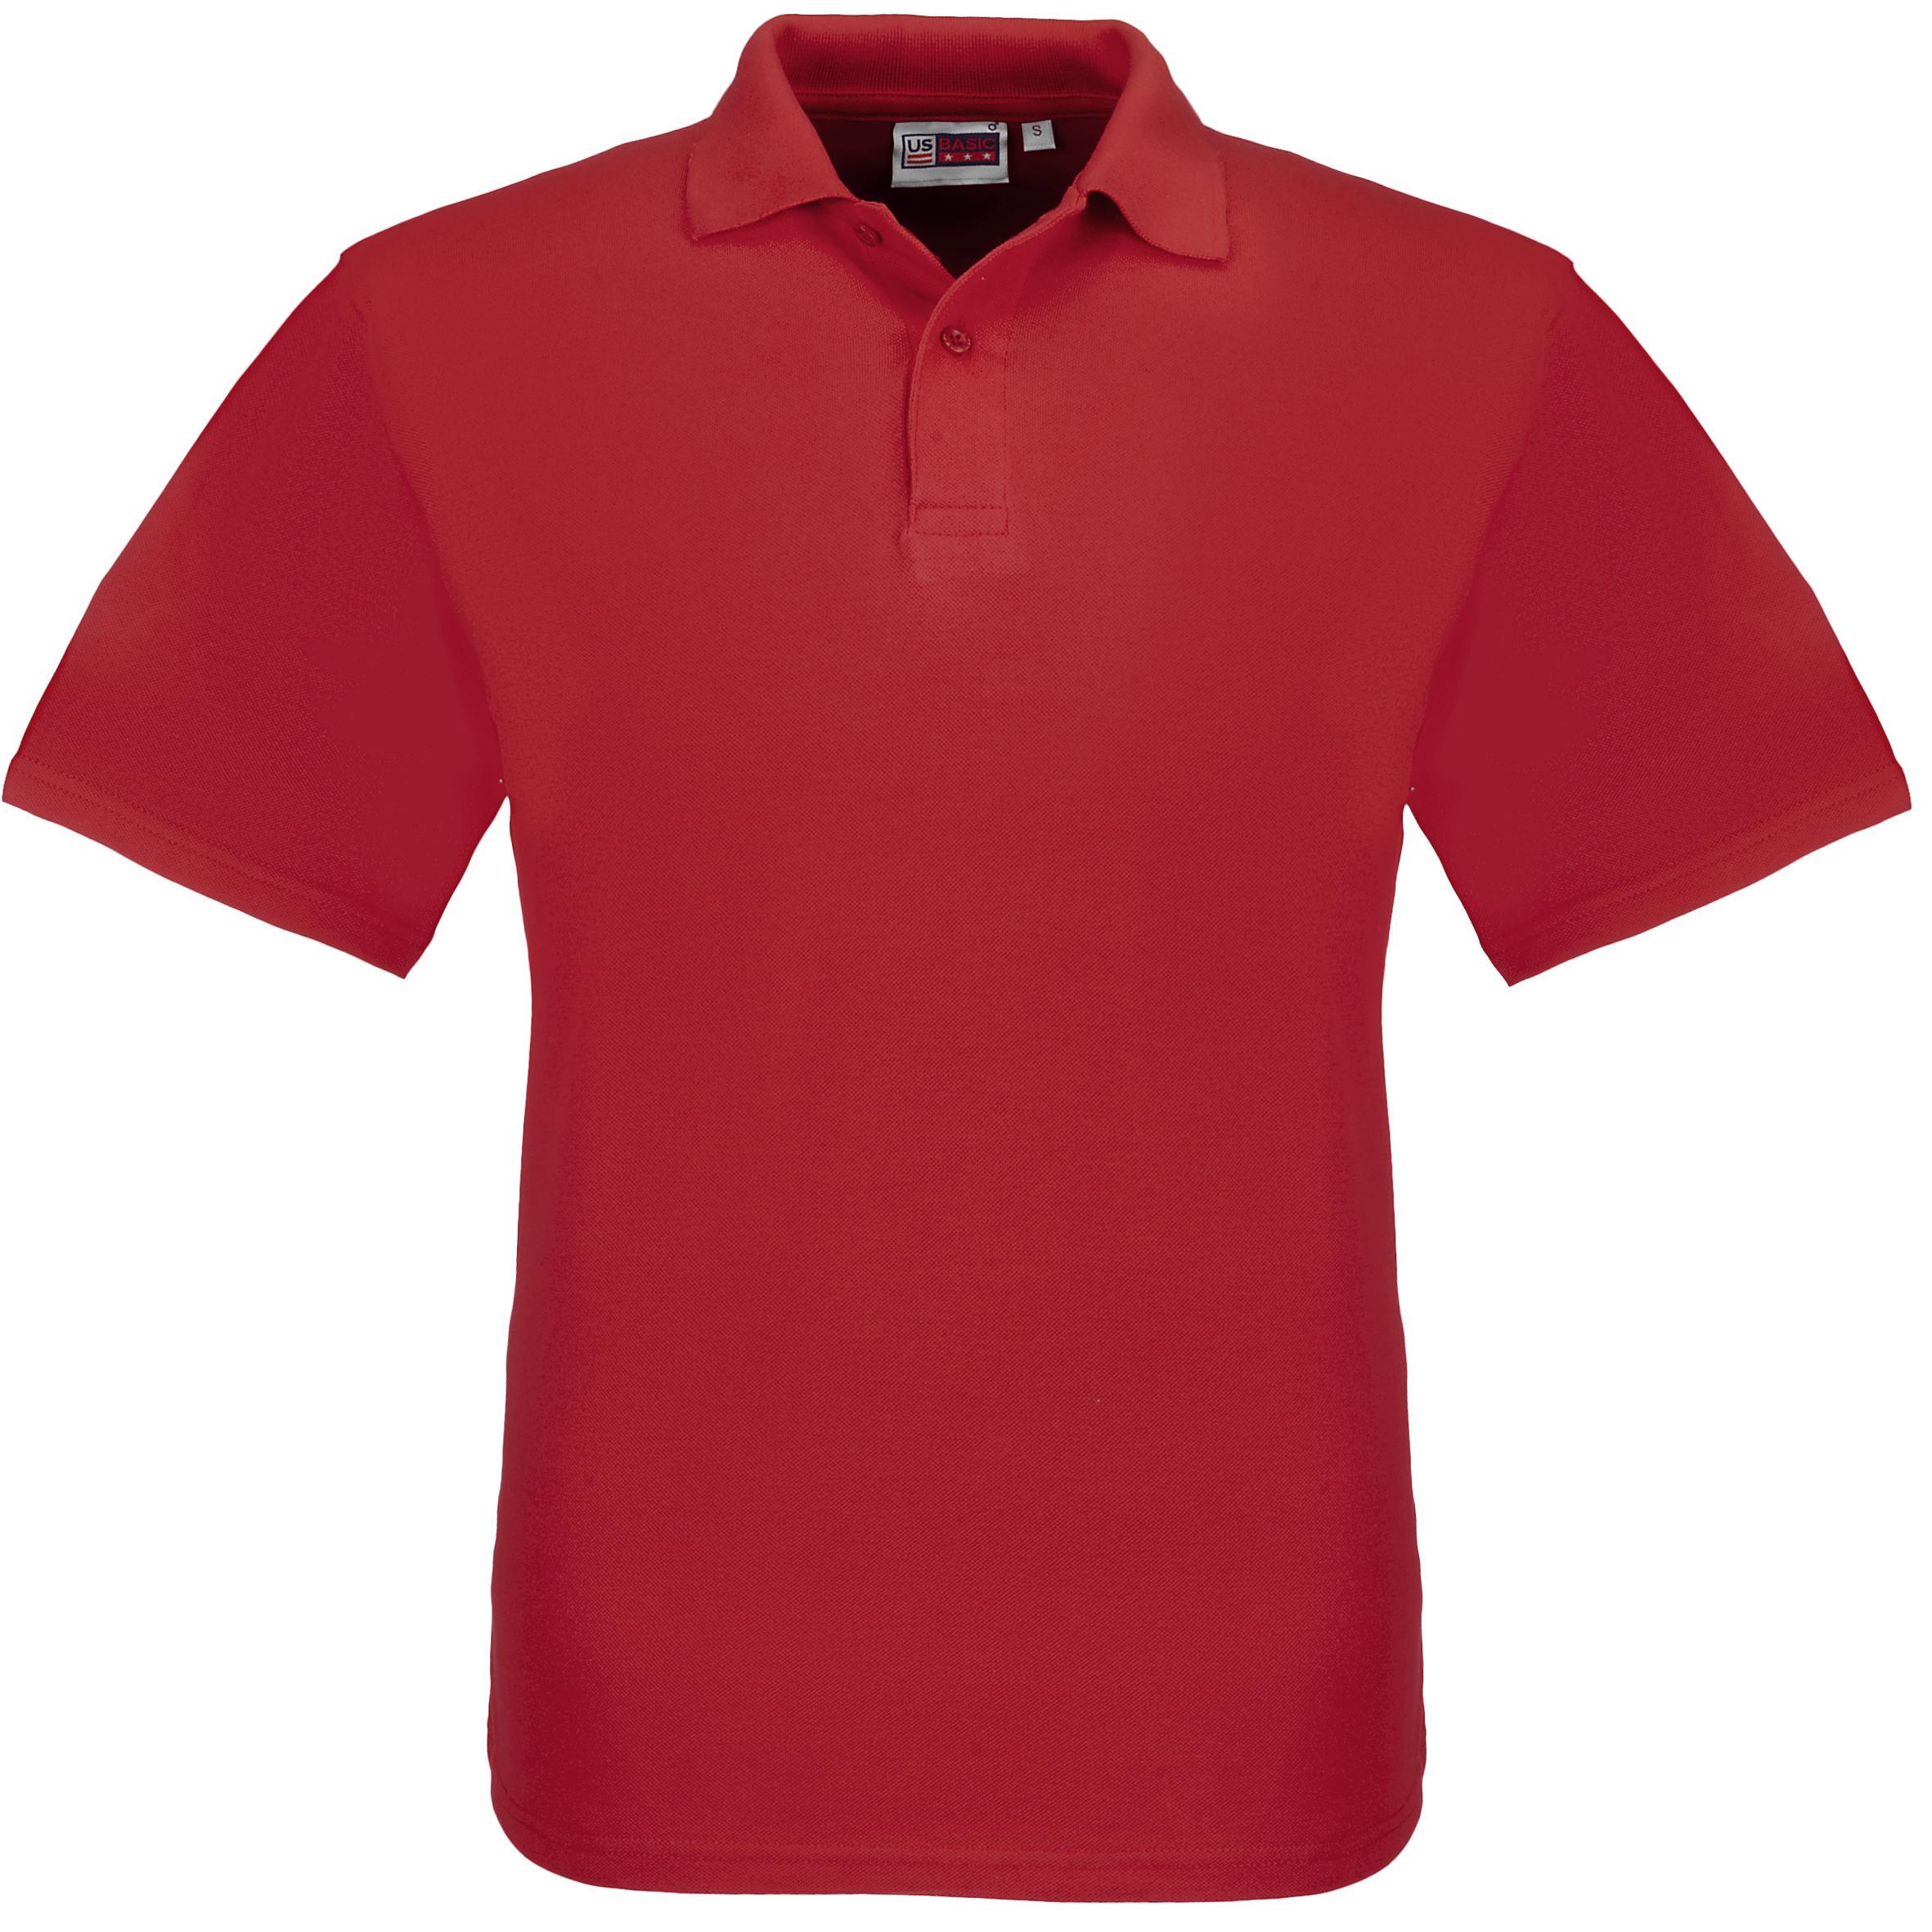 Kids Elemental Golf Shirt - Red Only